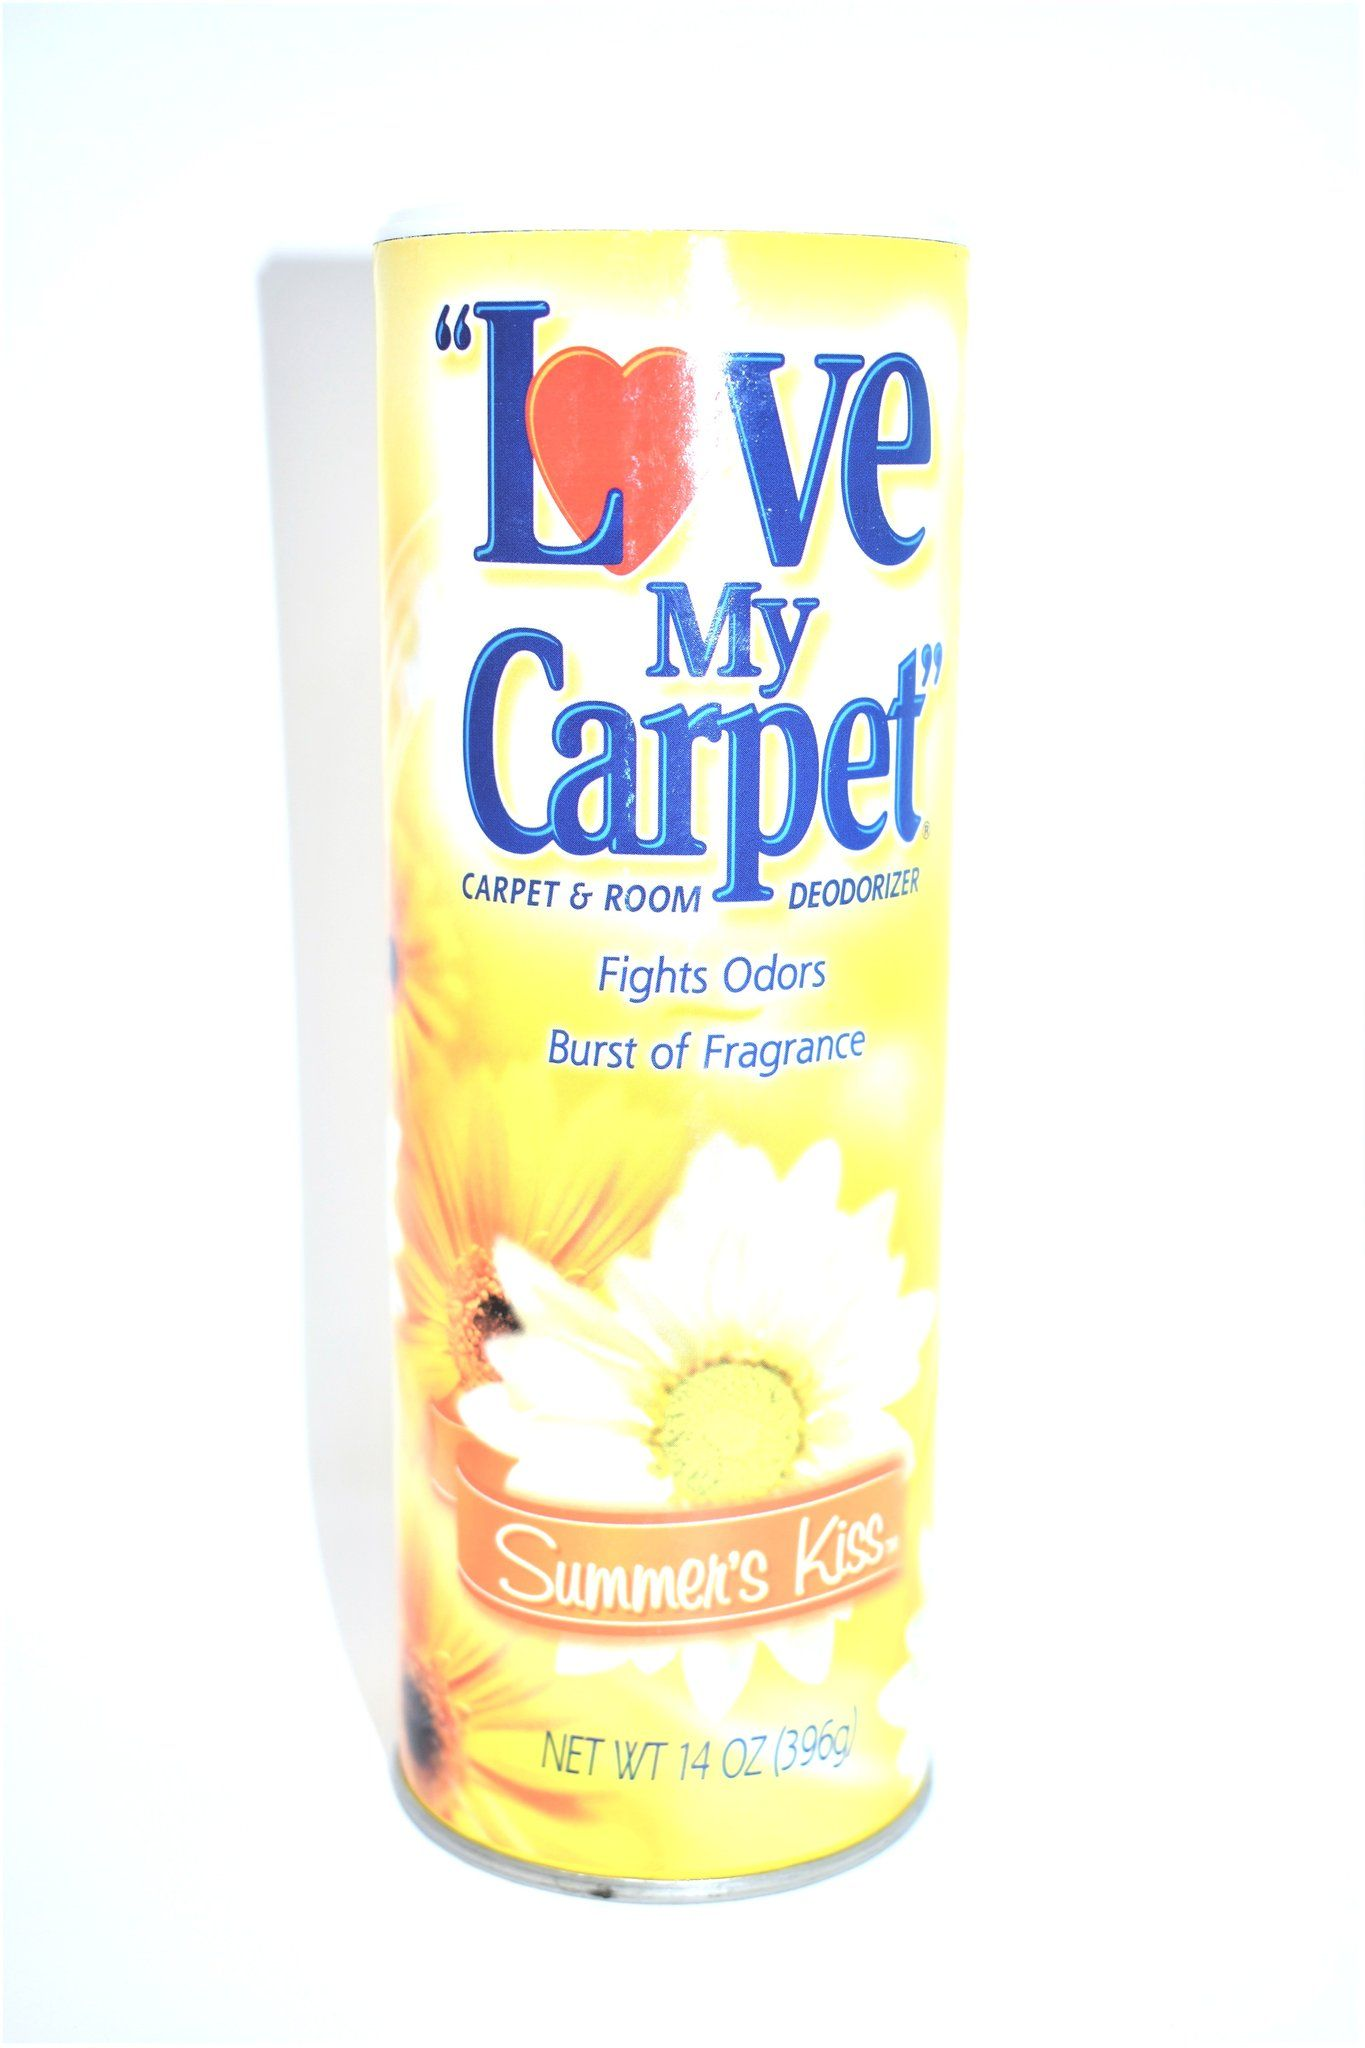 Love My Carpet Summer S Kiss Carpet Room Deodorizer 14 Oz Room Deodorizer Deodorant Clean Scents